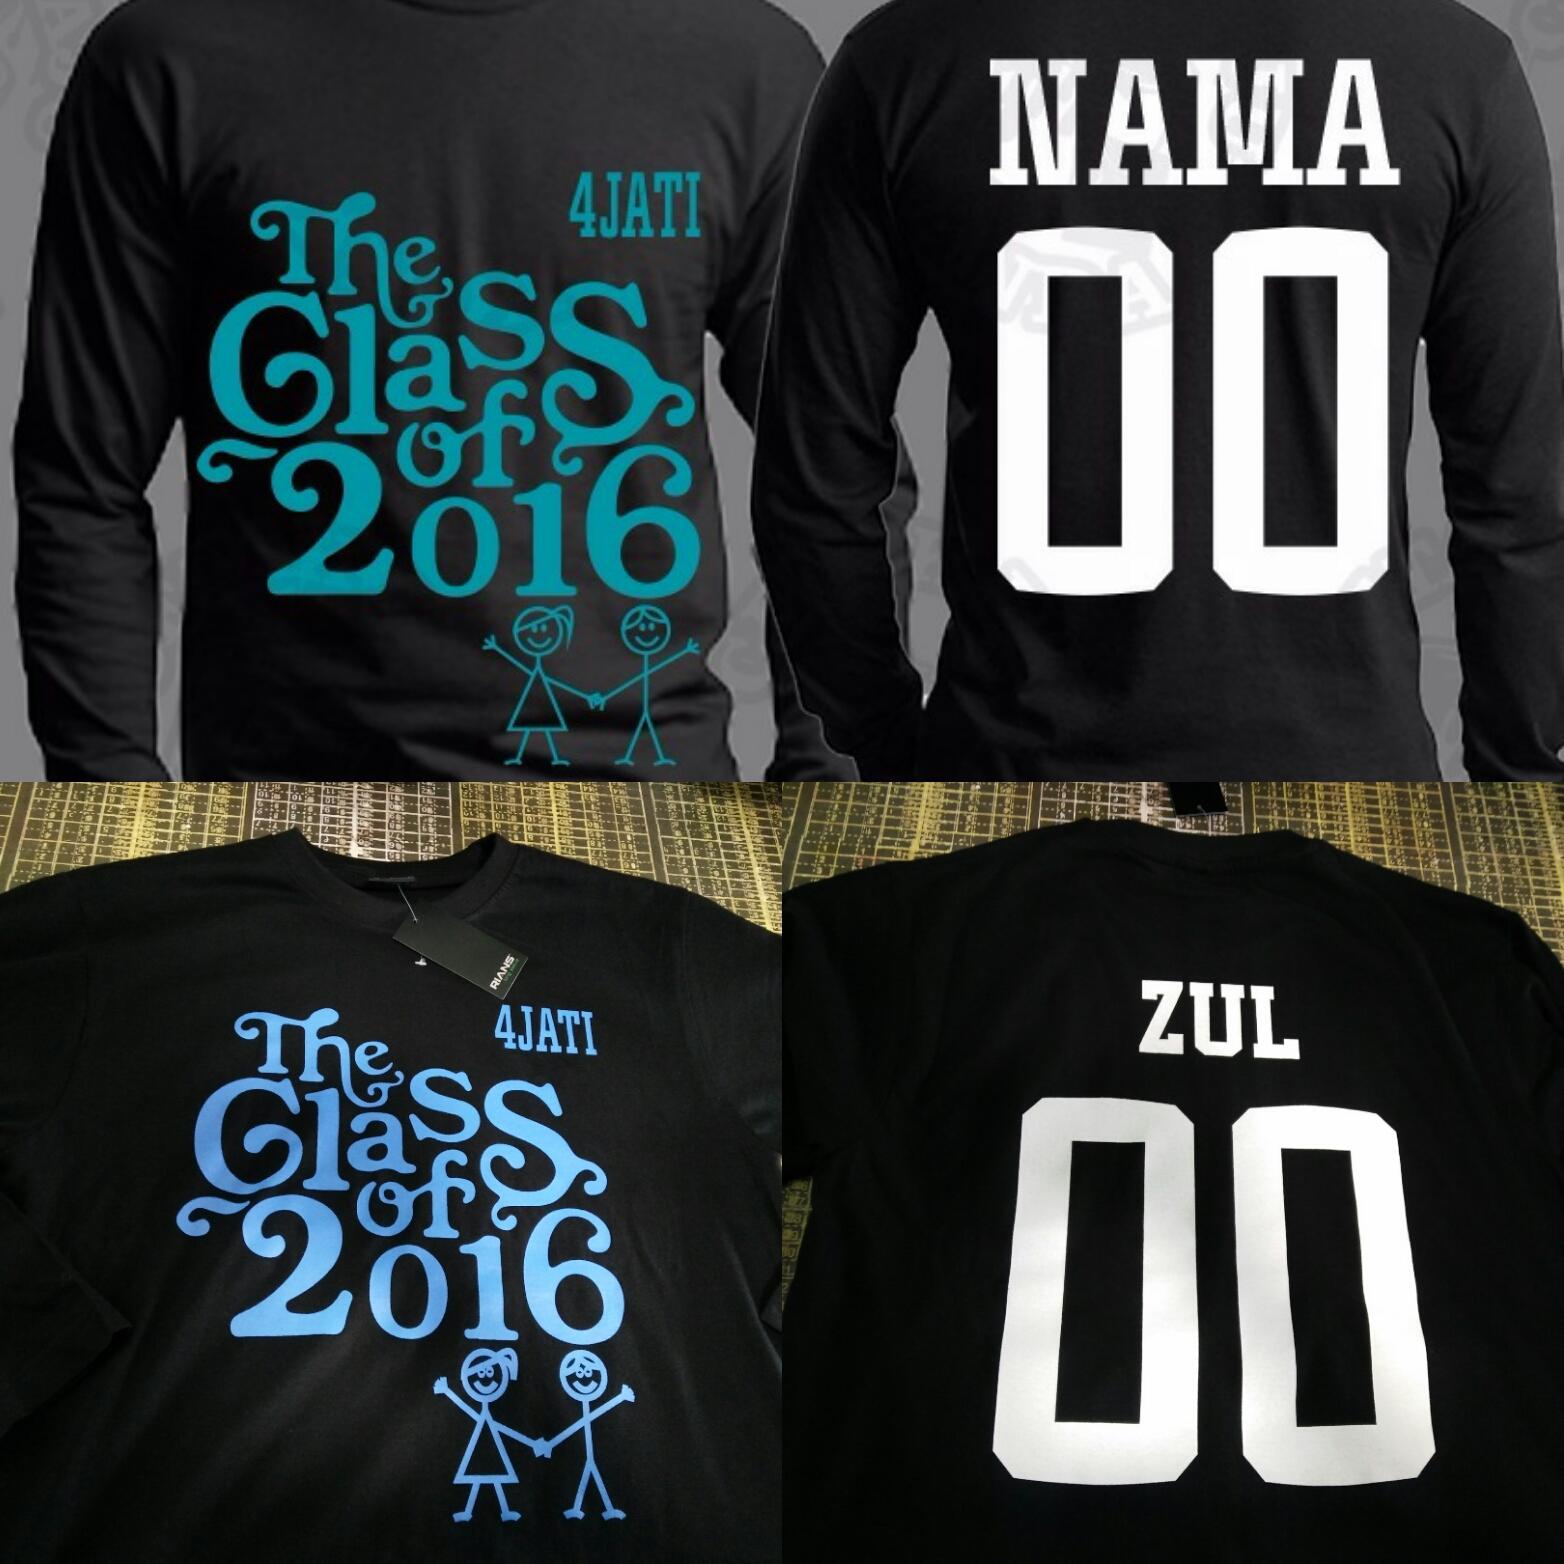 Contoh design tshirt kelas - Design T Shirt Kelas Terbaru Design T Shirt Kelas Terbaru 013 2850982 Zul Call Whatsapp